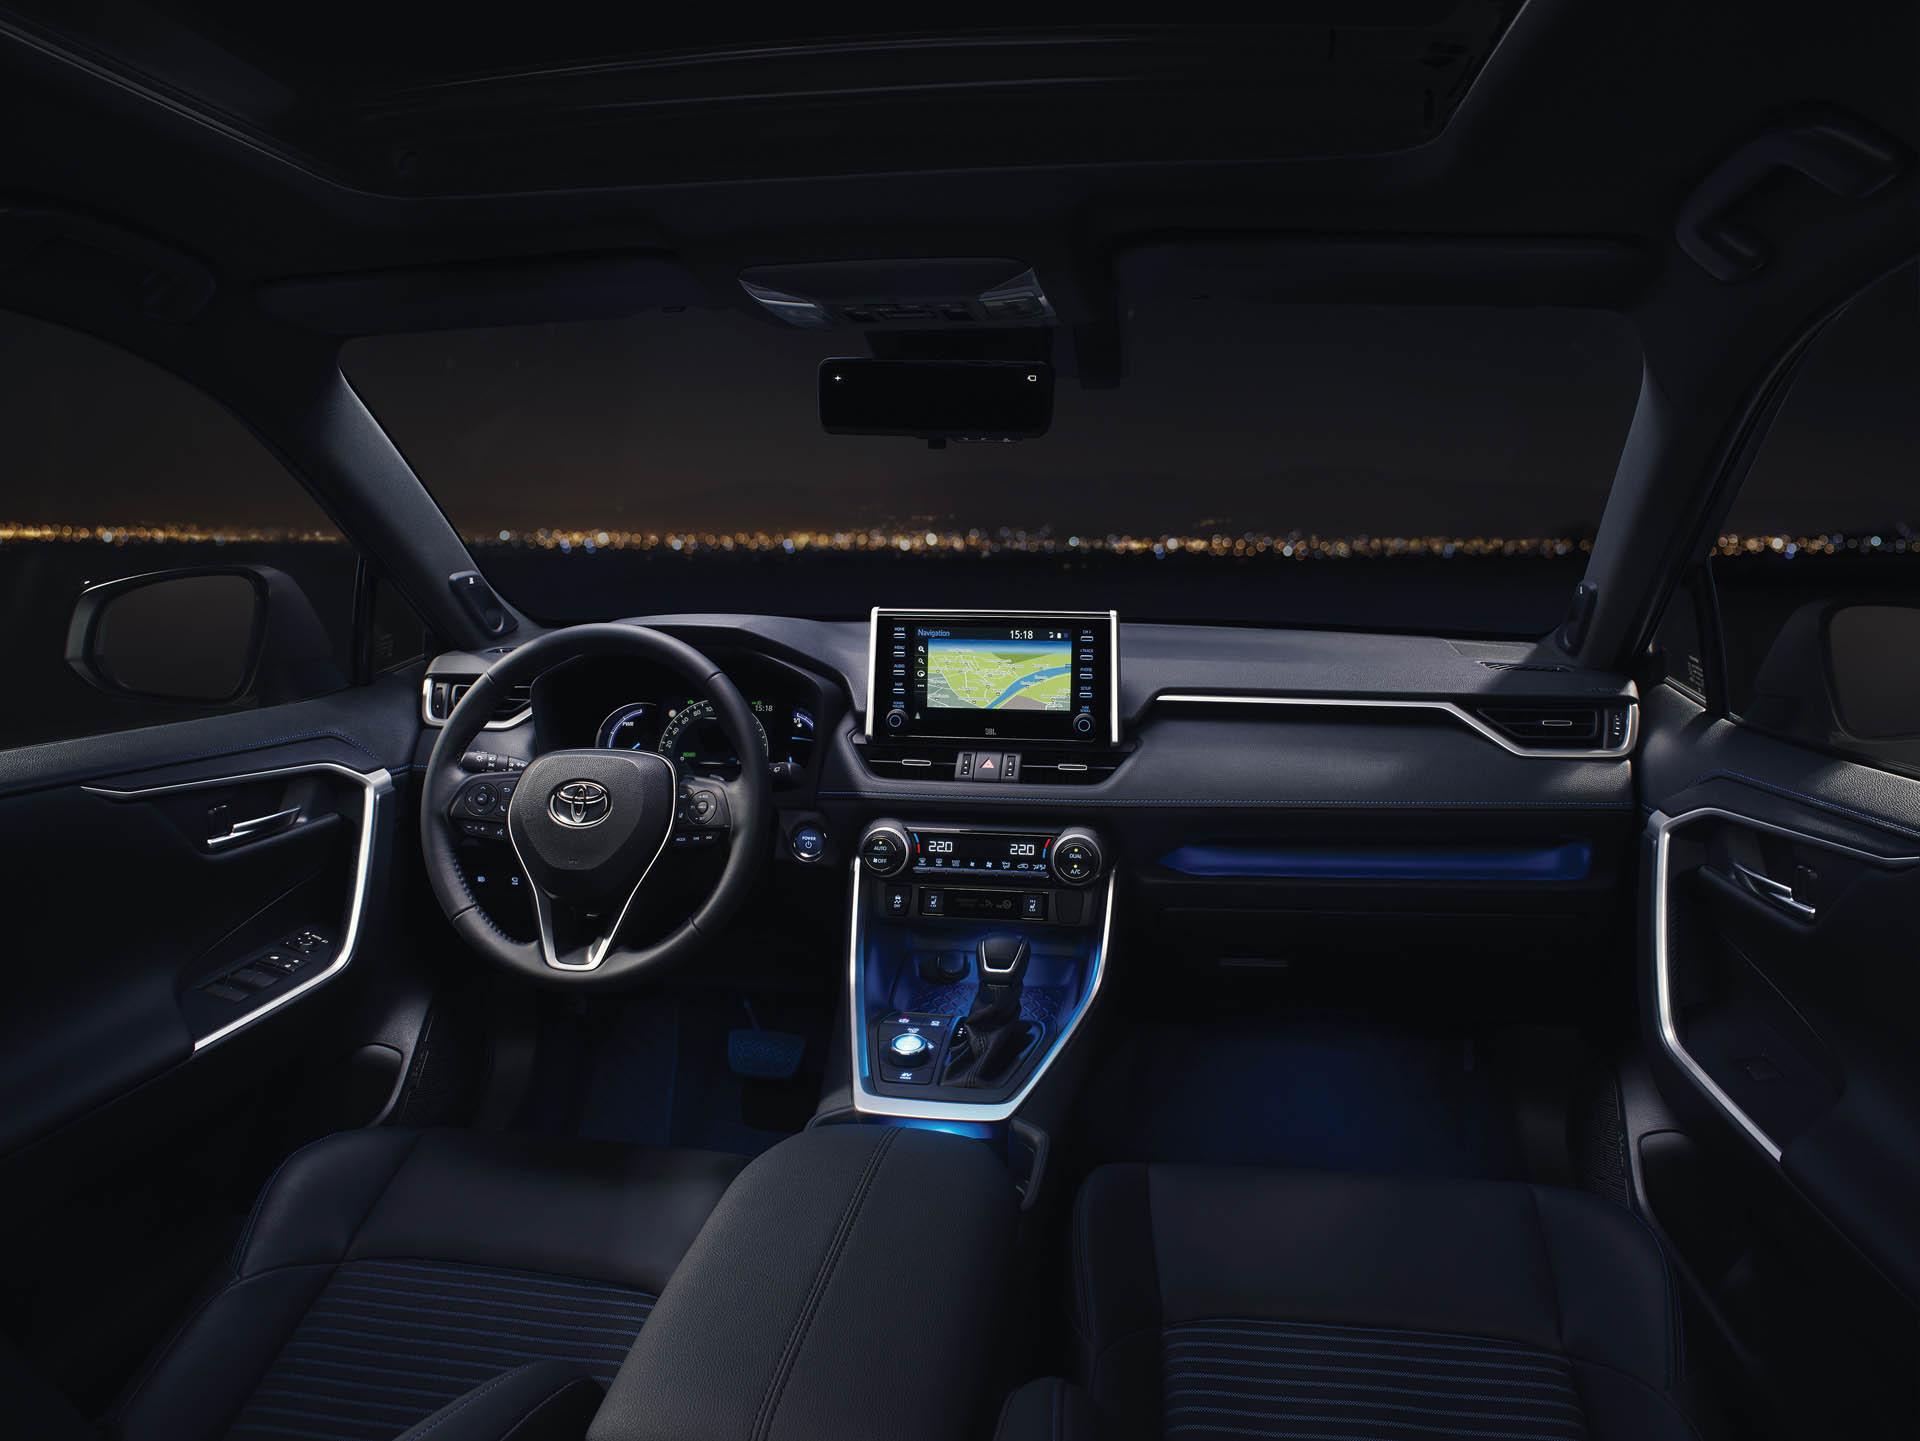 Nowa Toyota Rav4 2019 Piata Generacja Zdjecia Motofilm Pl